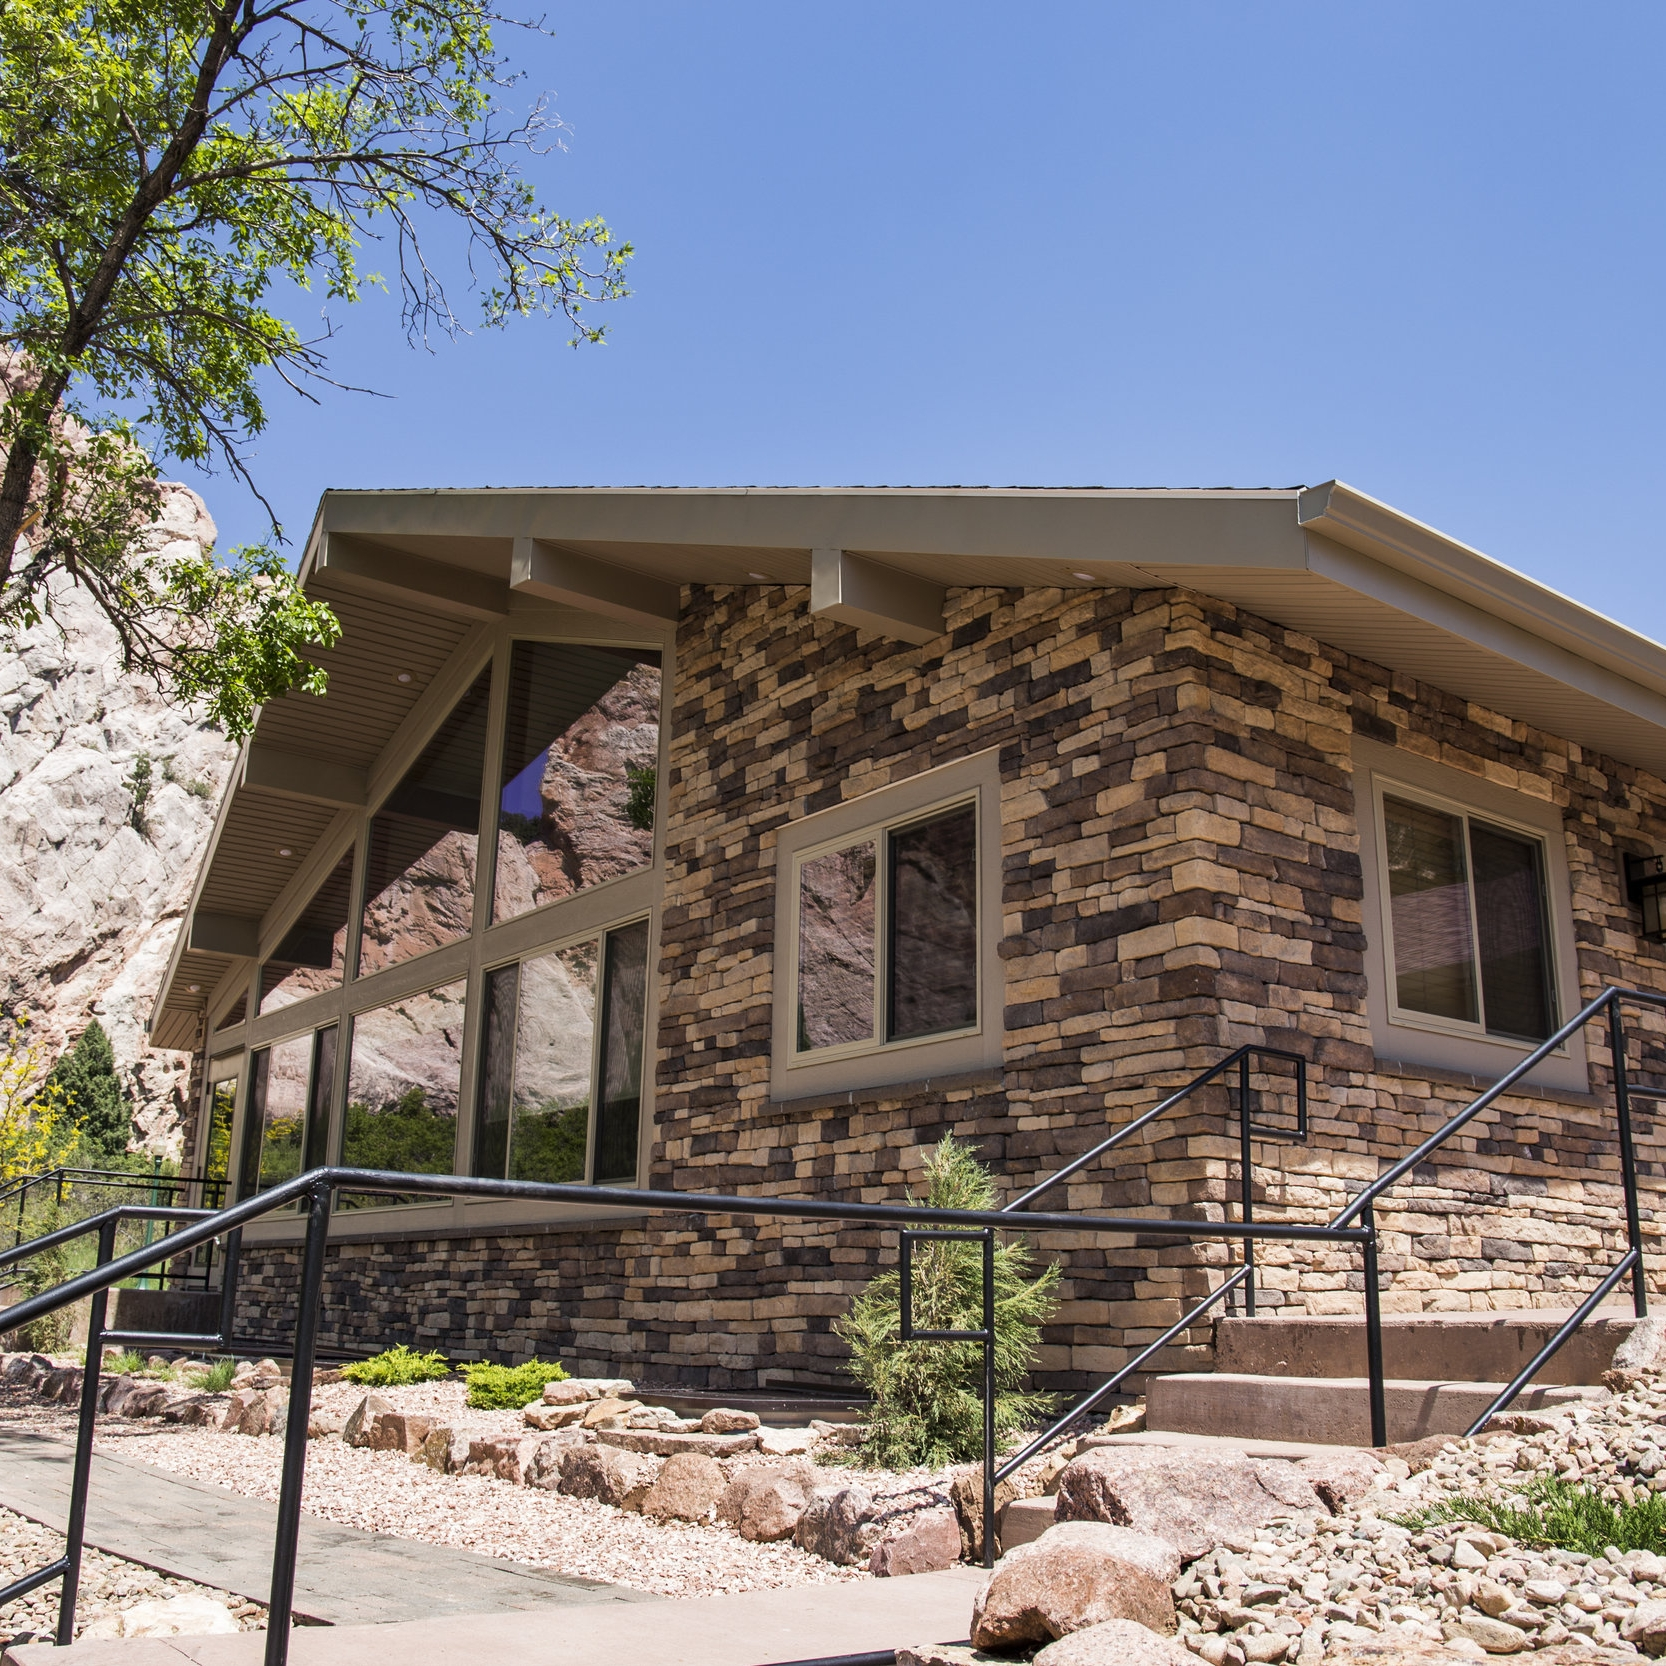 CEDAR RIDGE RENOVATION - Colorado Springs, CO